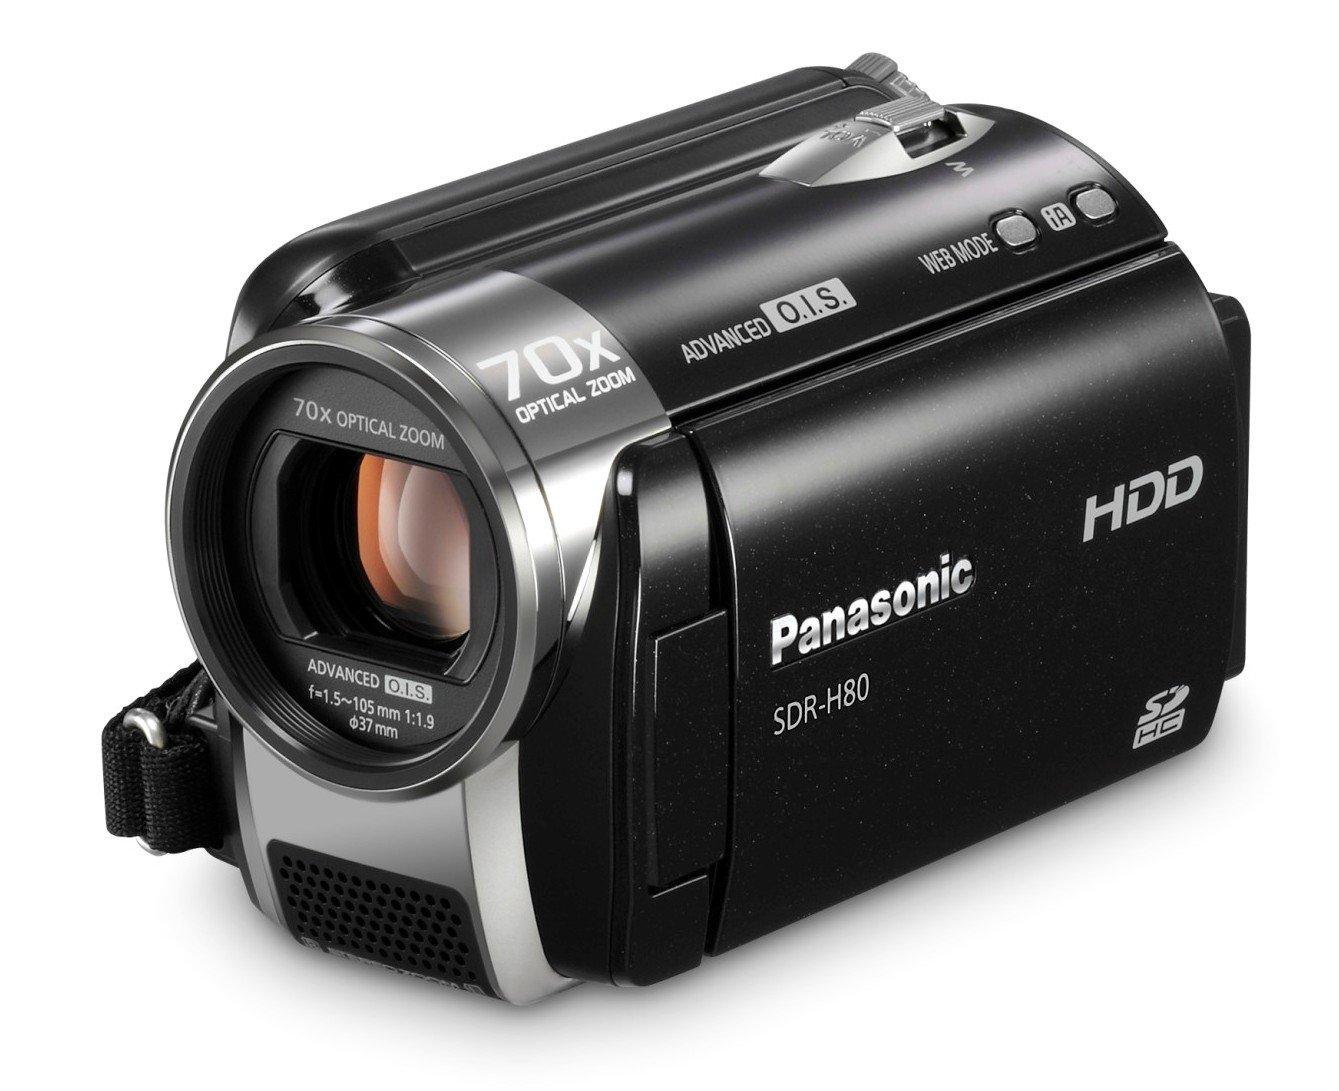 amazon com panasonic sdr h80 sd and hdd camcorder black hard rh amazon com